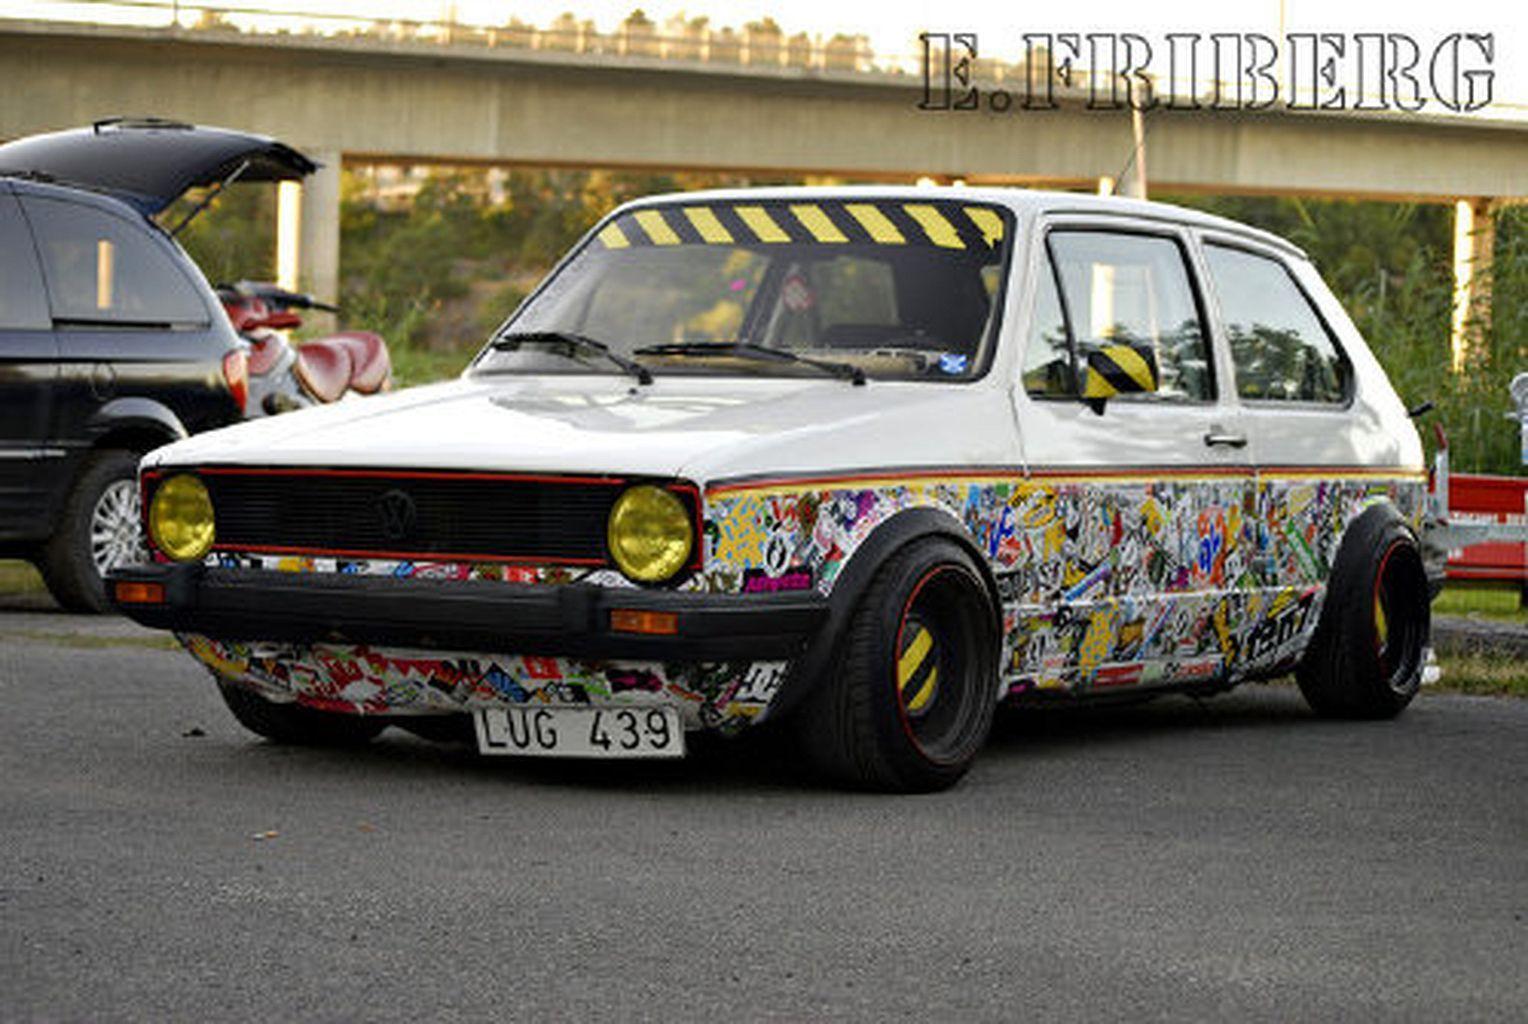 Car Wraps Ideas Awesome Https Www Mobmasker Com Car Wraps Ideas Awesome Volkswagen Golf Mk2 Volkswagen Car [ 1024 x 1528 Pixel ]